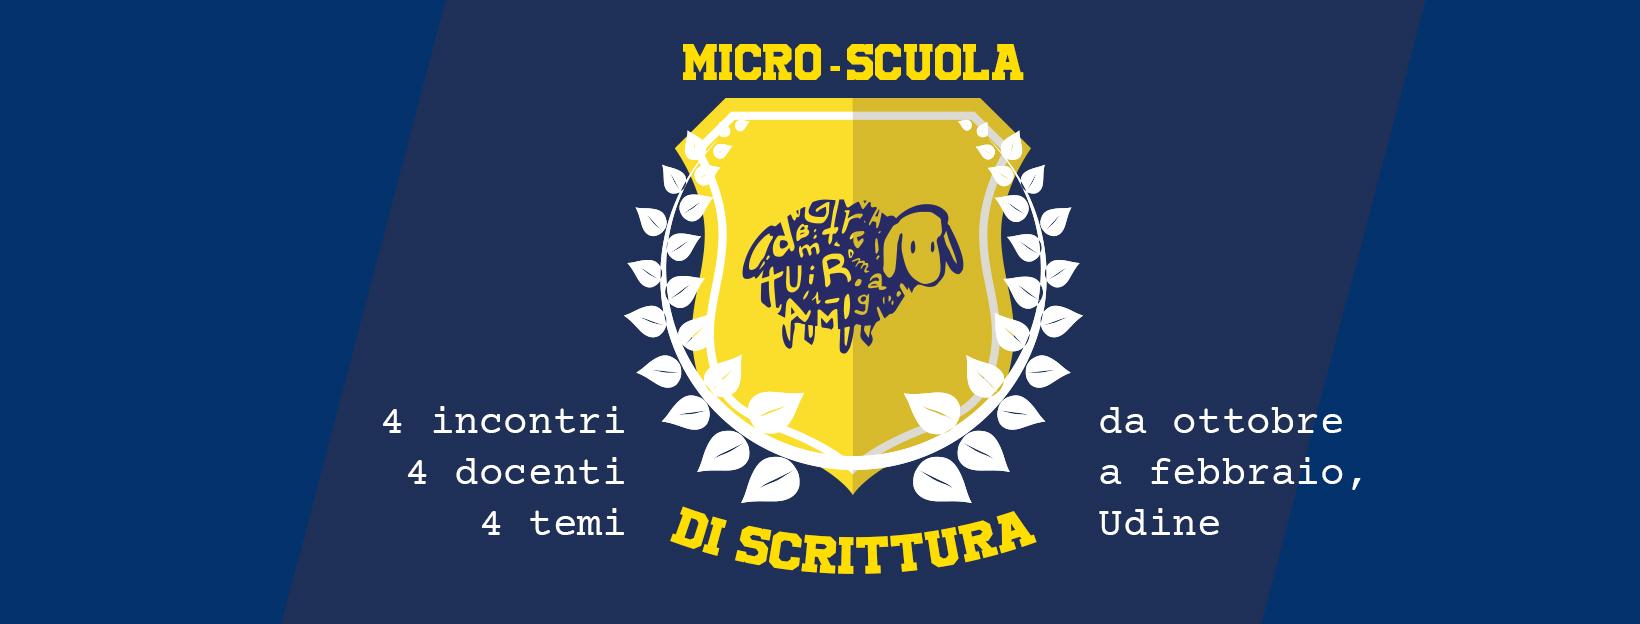 Micro scuola scrittura matearium Udine